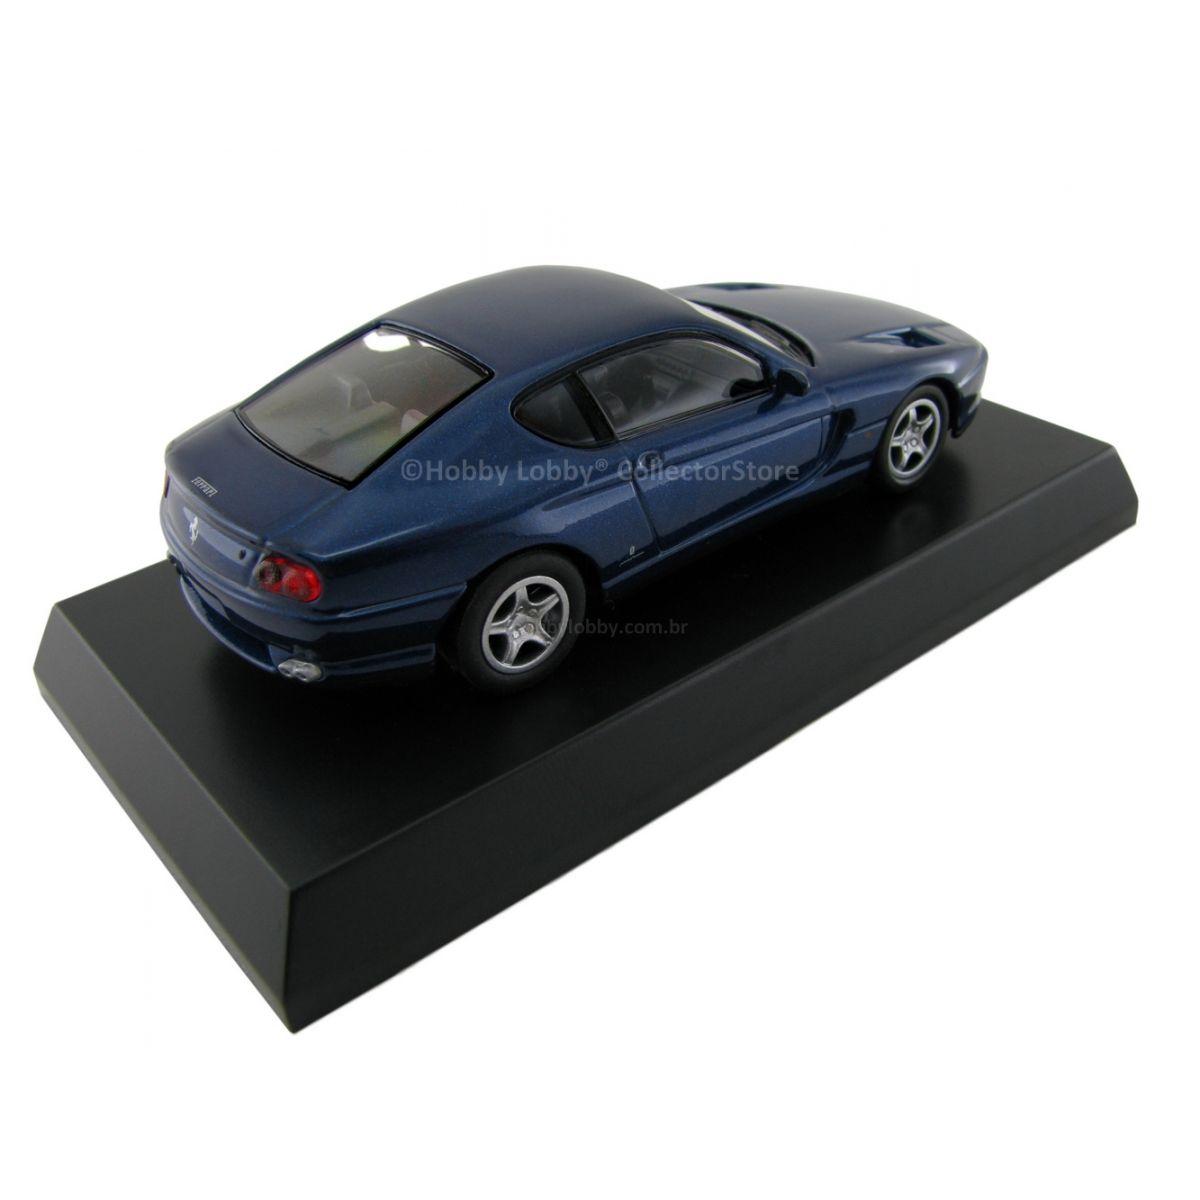 Kyosho - Ferrari Minicar Collection VI - Ferrari 456 GT [azul]  - Hobby Lobby CollectorStore